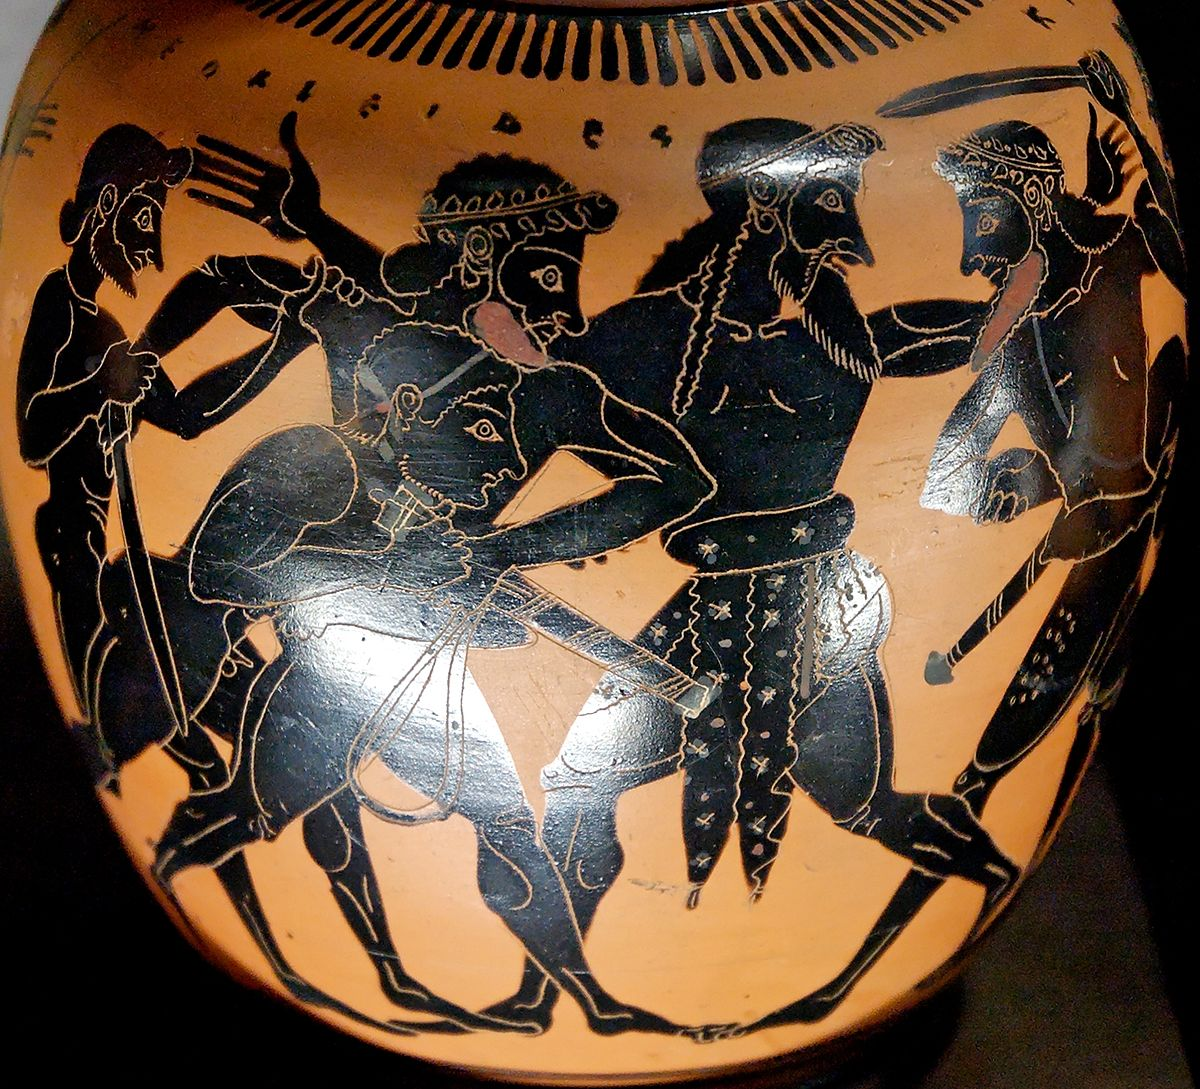 File:Odysseus Ajax Louvre F340.jpg - Wikimedia Commons